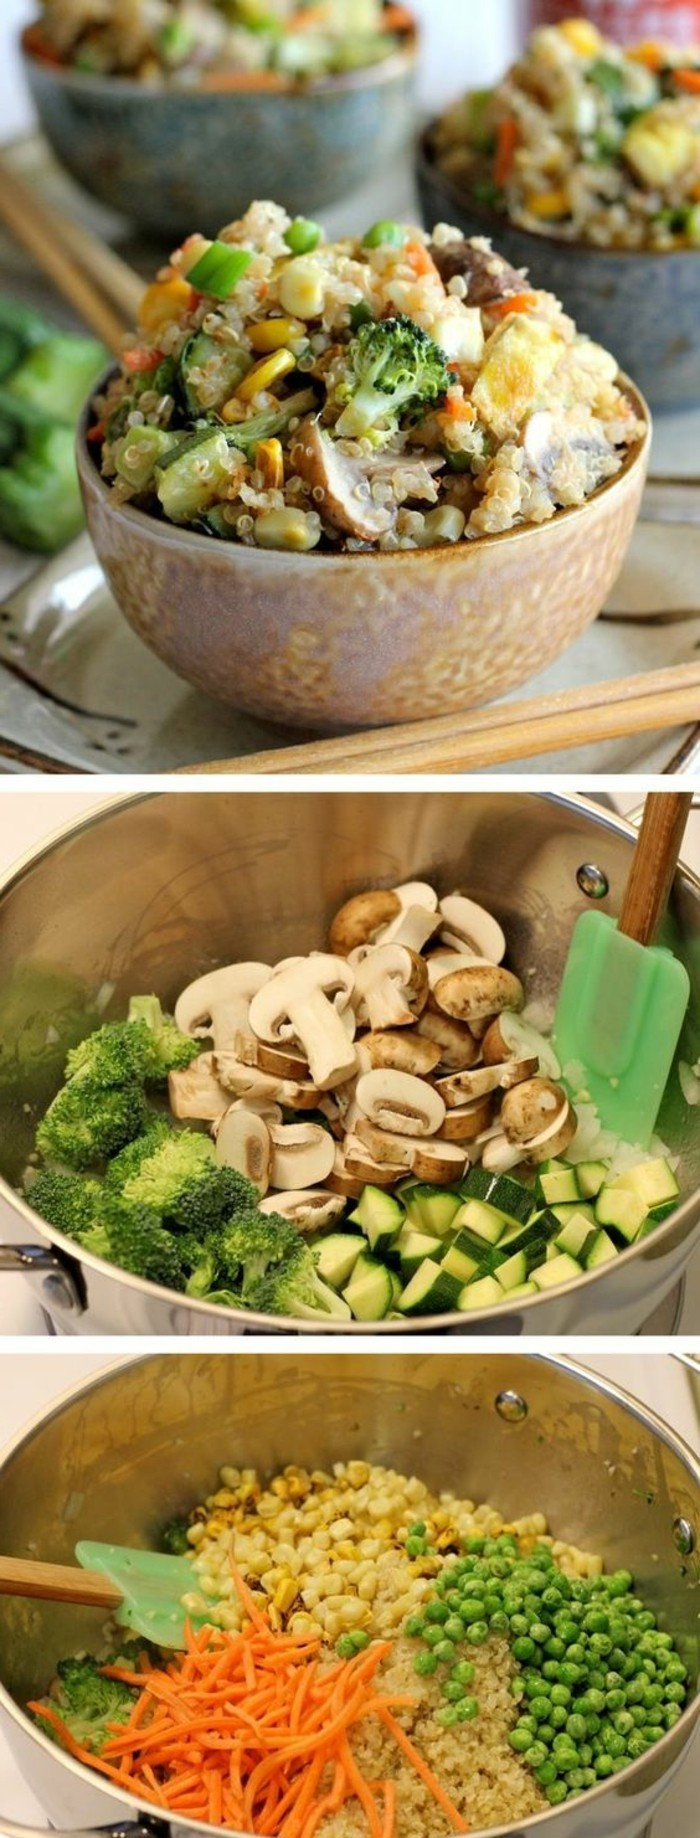 1-idee-repas-equilibre-menu-équilibré-pas-cher-petits-plats-en-quilibres-idees-recettes